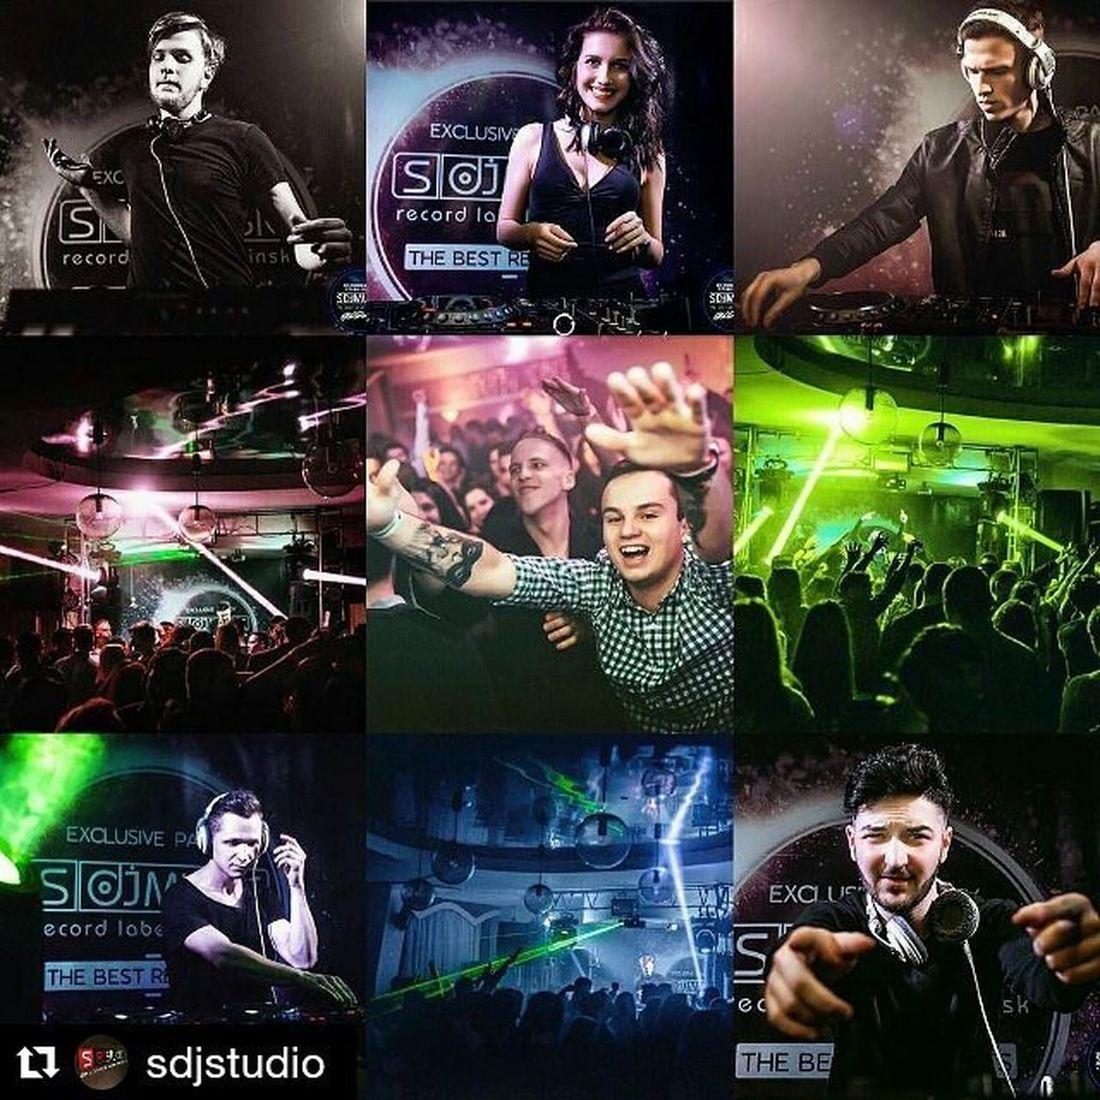 SDJ SDJMusic_Record_Label SDJStudio Live Naroch Party Music Edm Trap Svag Deephouse Futurehouse Clubhouse Bigroom Electroprogressive Electrohousemusic Amazing Goodnight People